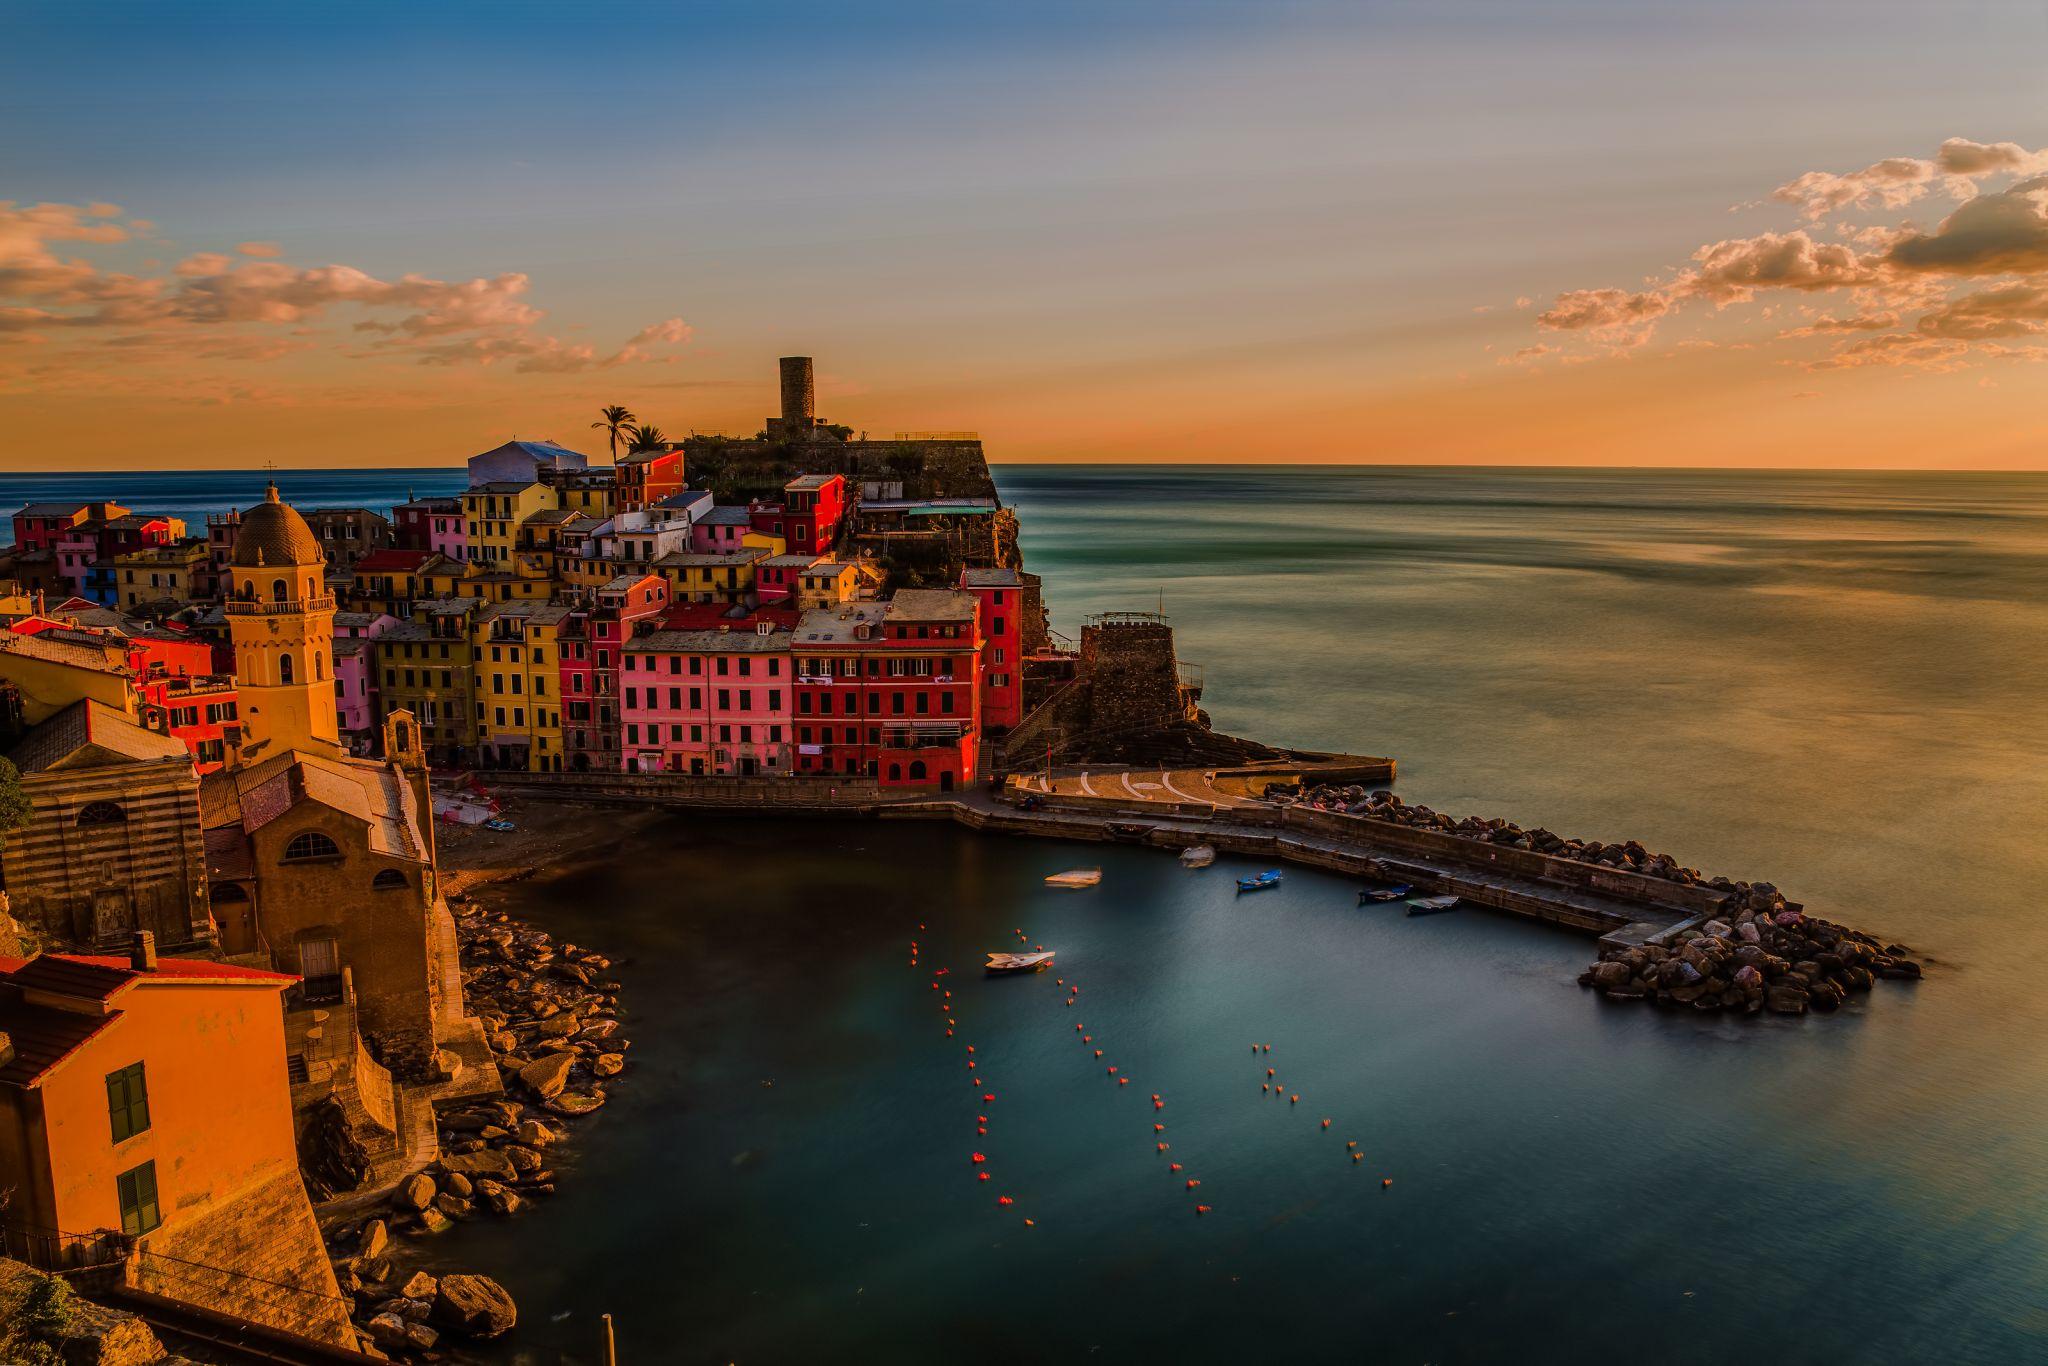 Sunset on Vernazza, Italy